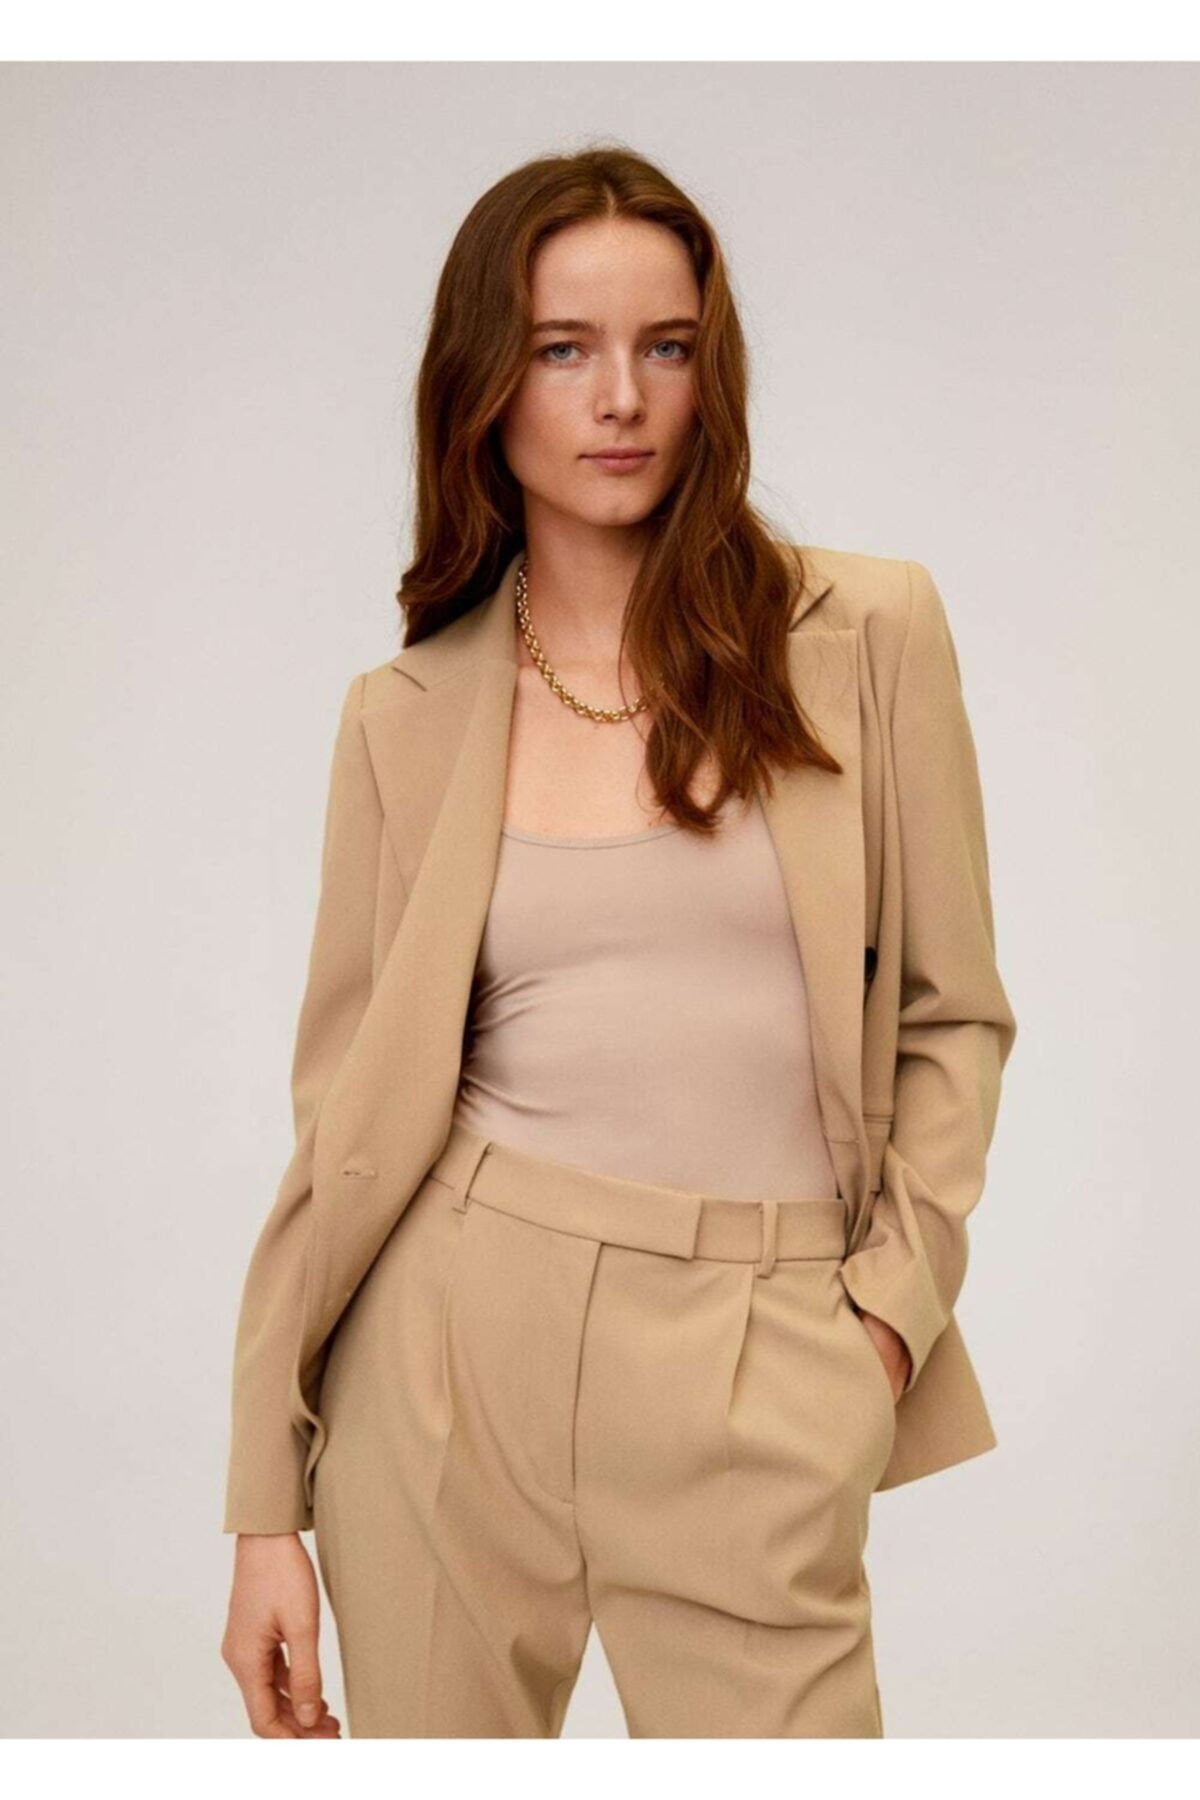 MANGO Woman Kadın Orta Kahverengi Pilili Kısa Paçalı Pantolon 67054404 1